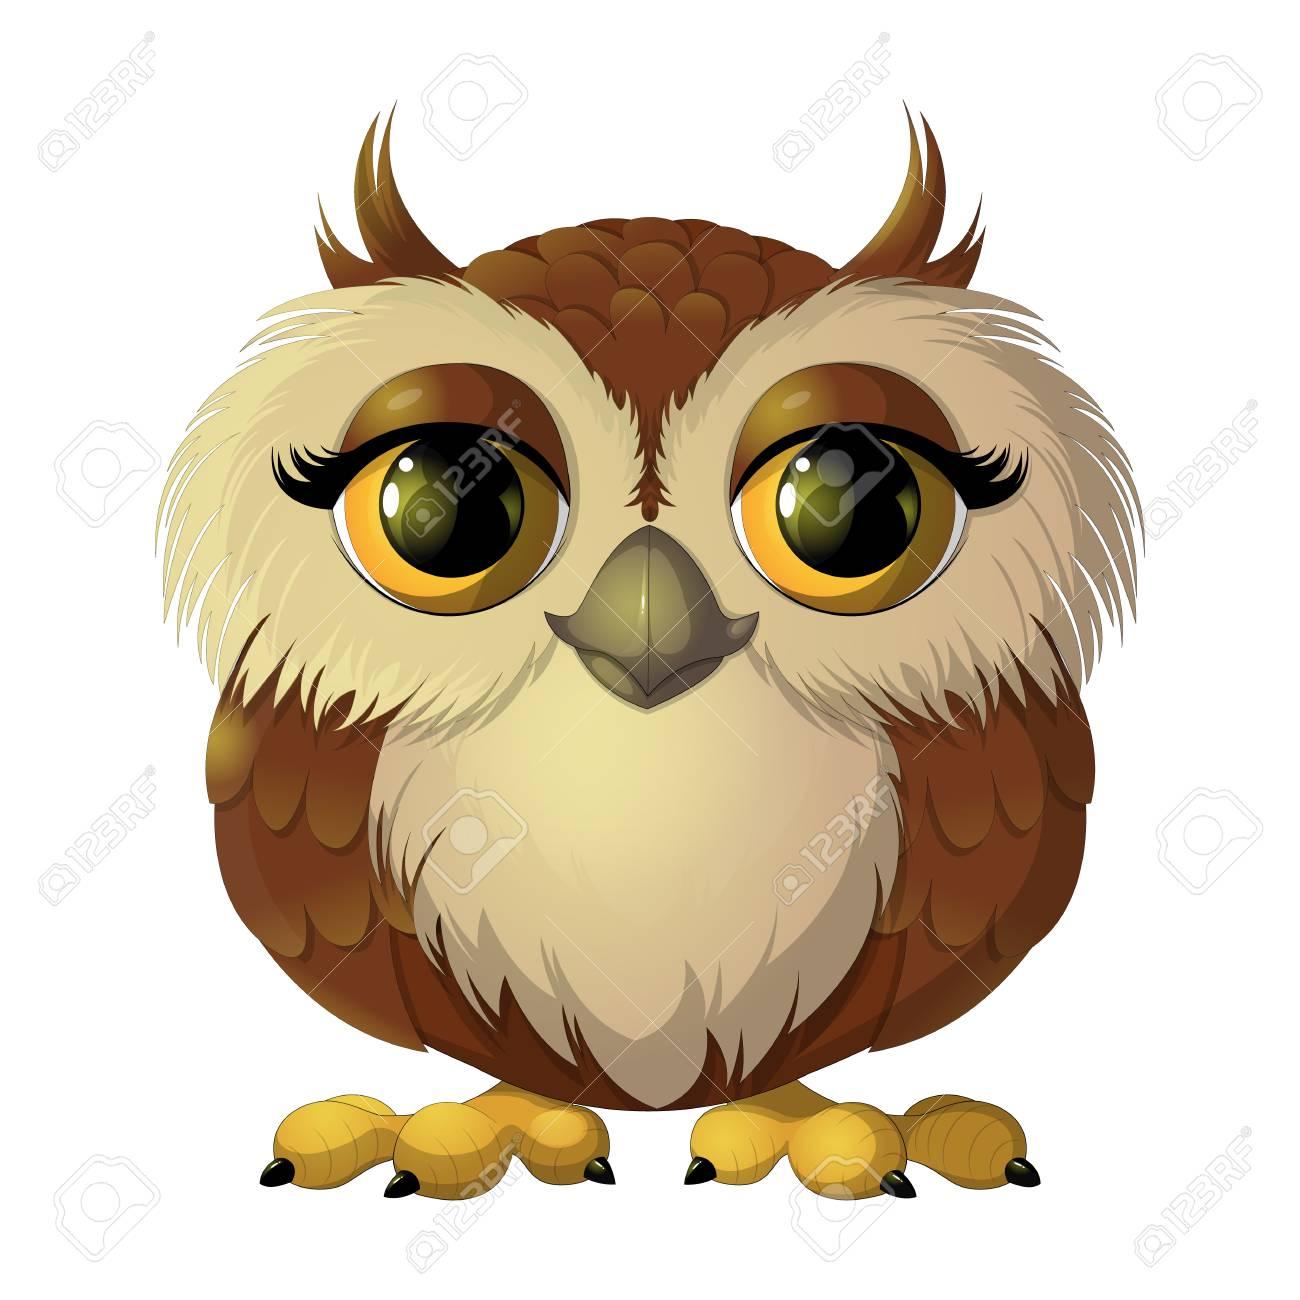 Cute brown owl Stock Vector - 75673672 280518d34a51